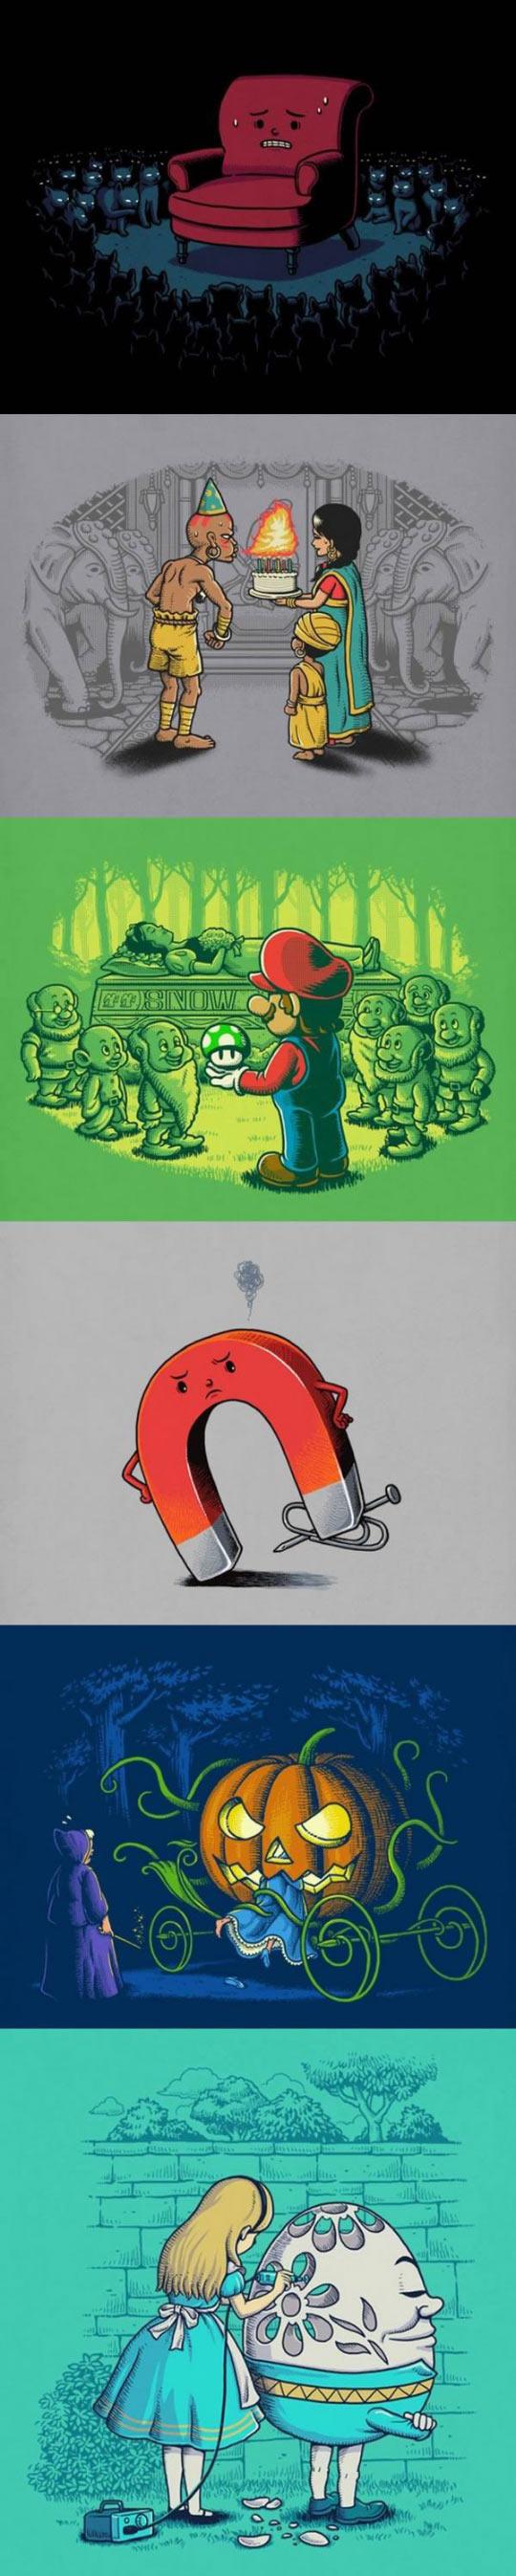 funny-illustrations-Pinocchio-Snow-White-Alice